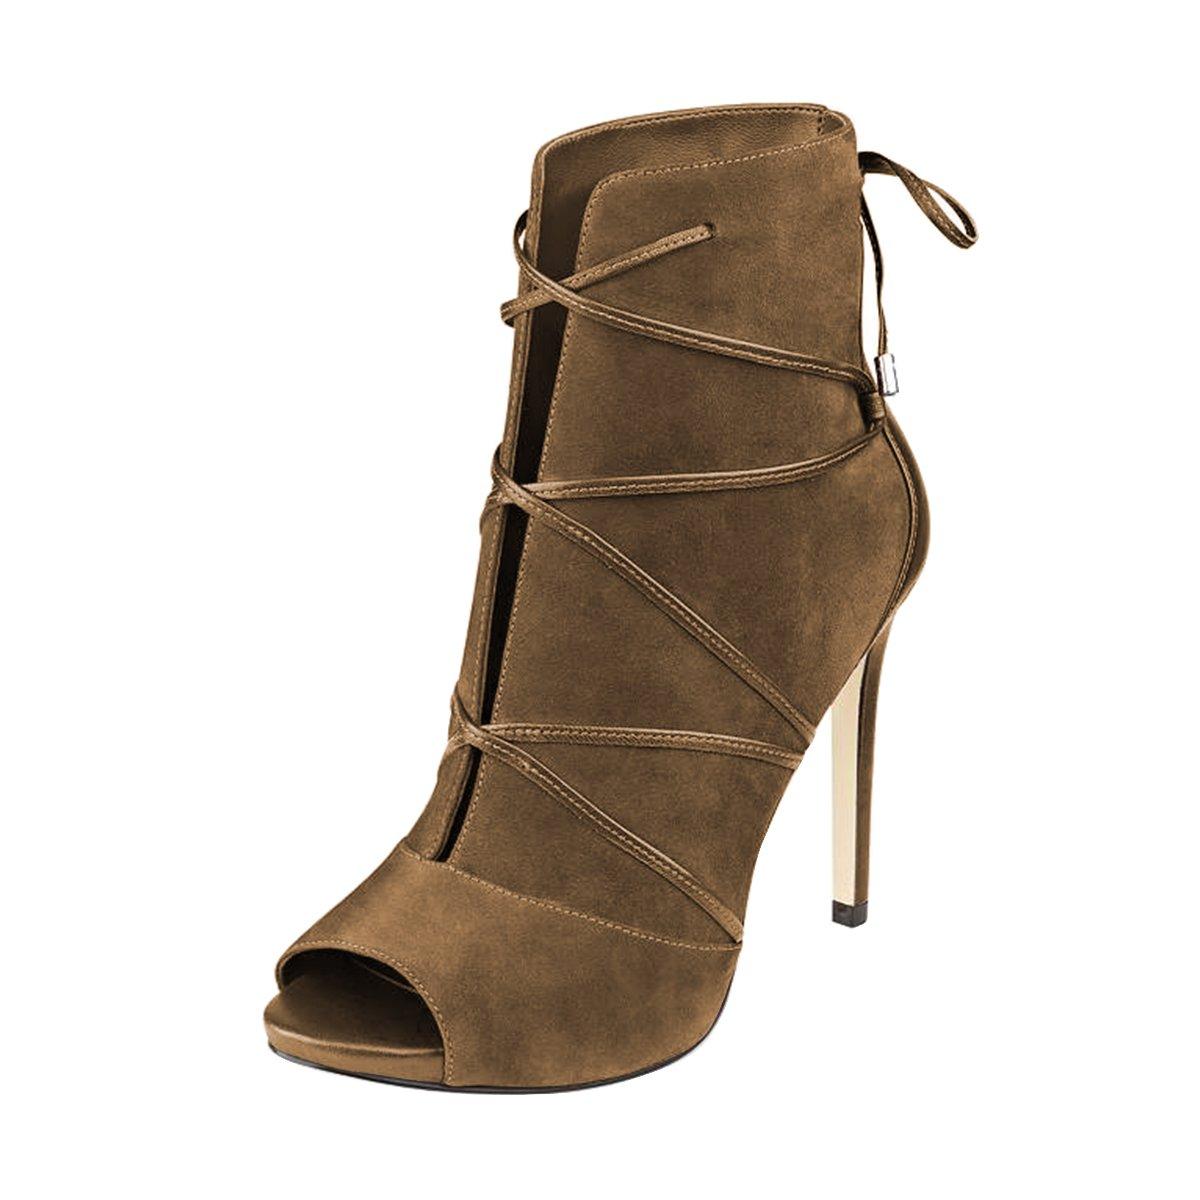 FSJ Women Peep Toe Ankle Booties Platform Stiletto Heels Lace up Cutout Comfort Shoes Size 12 Brown